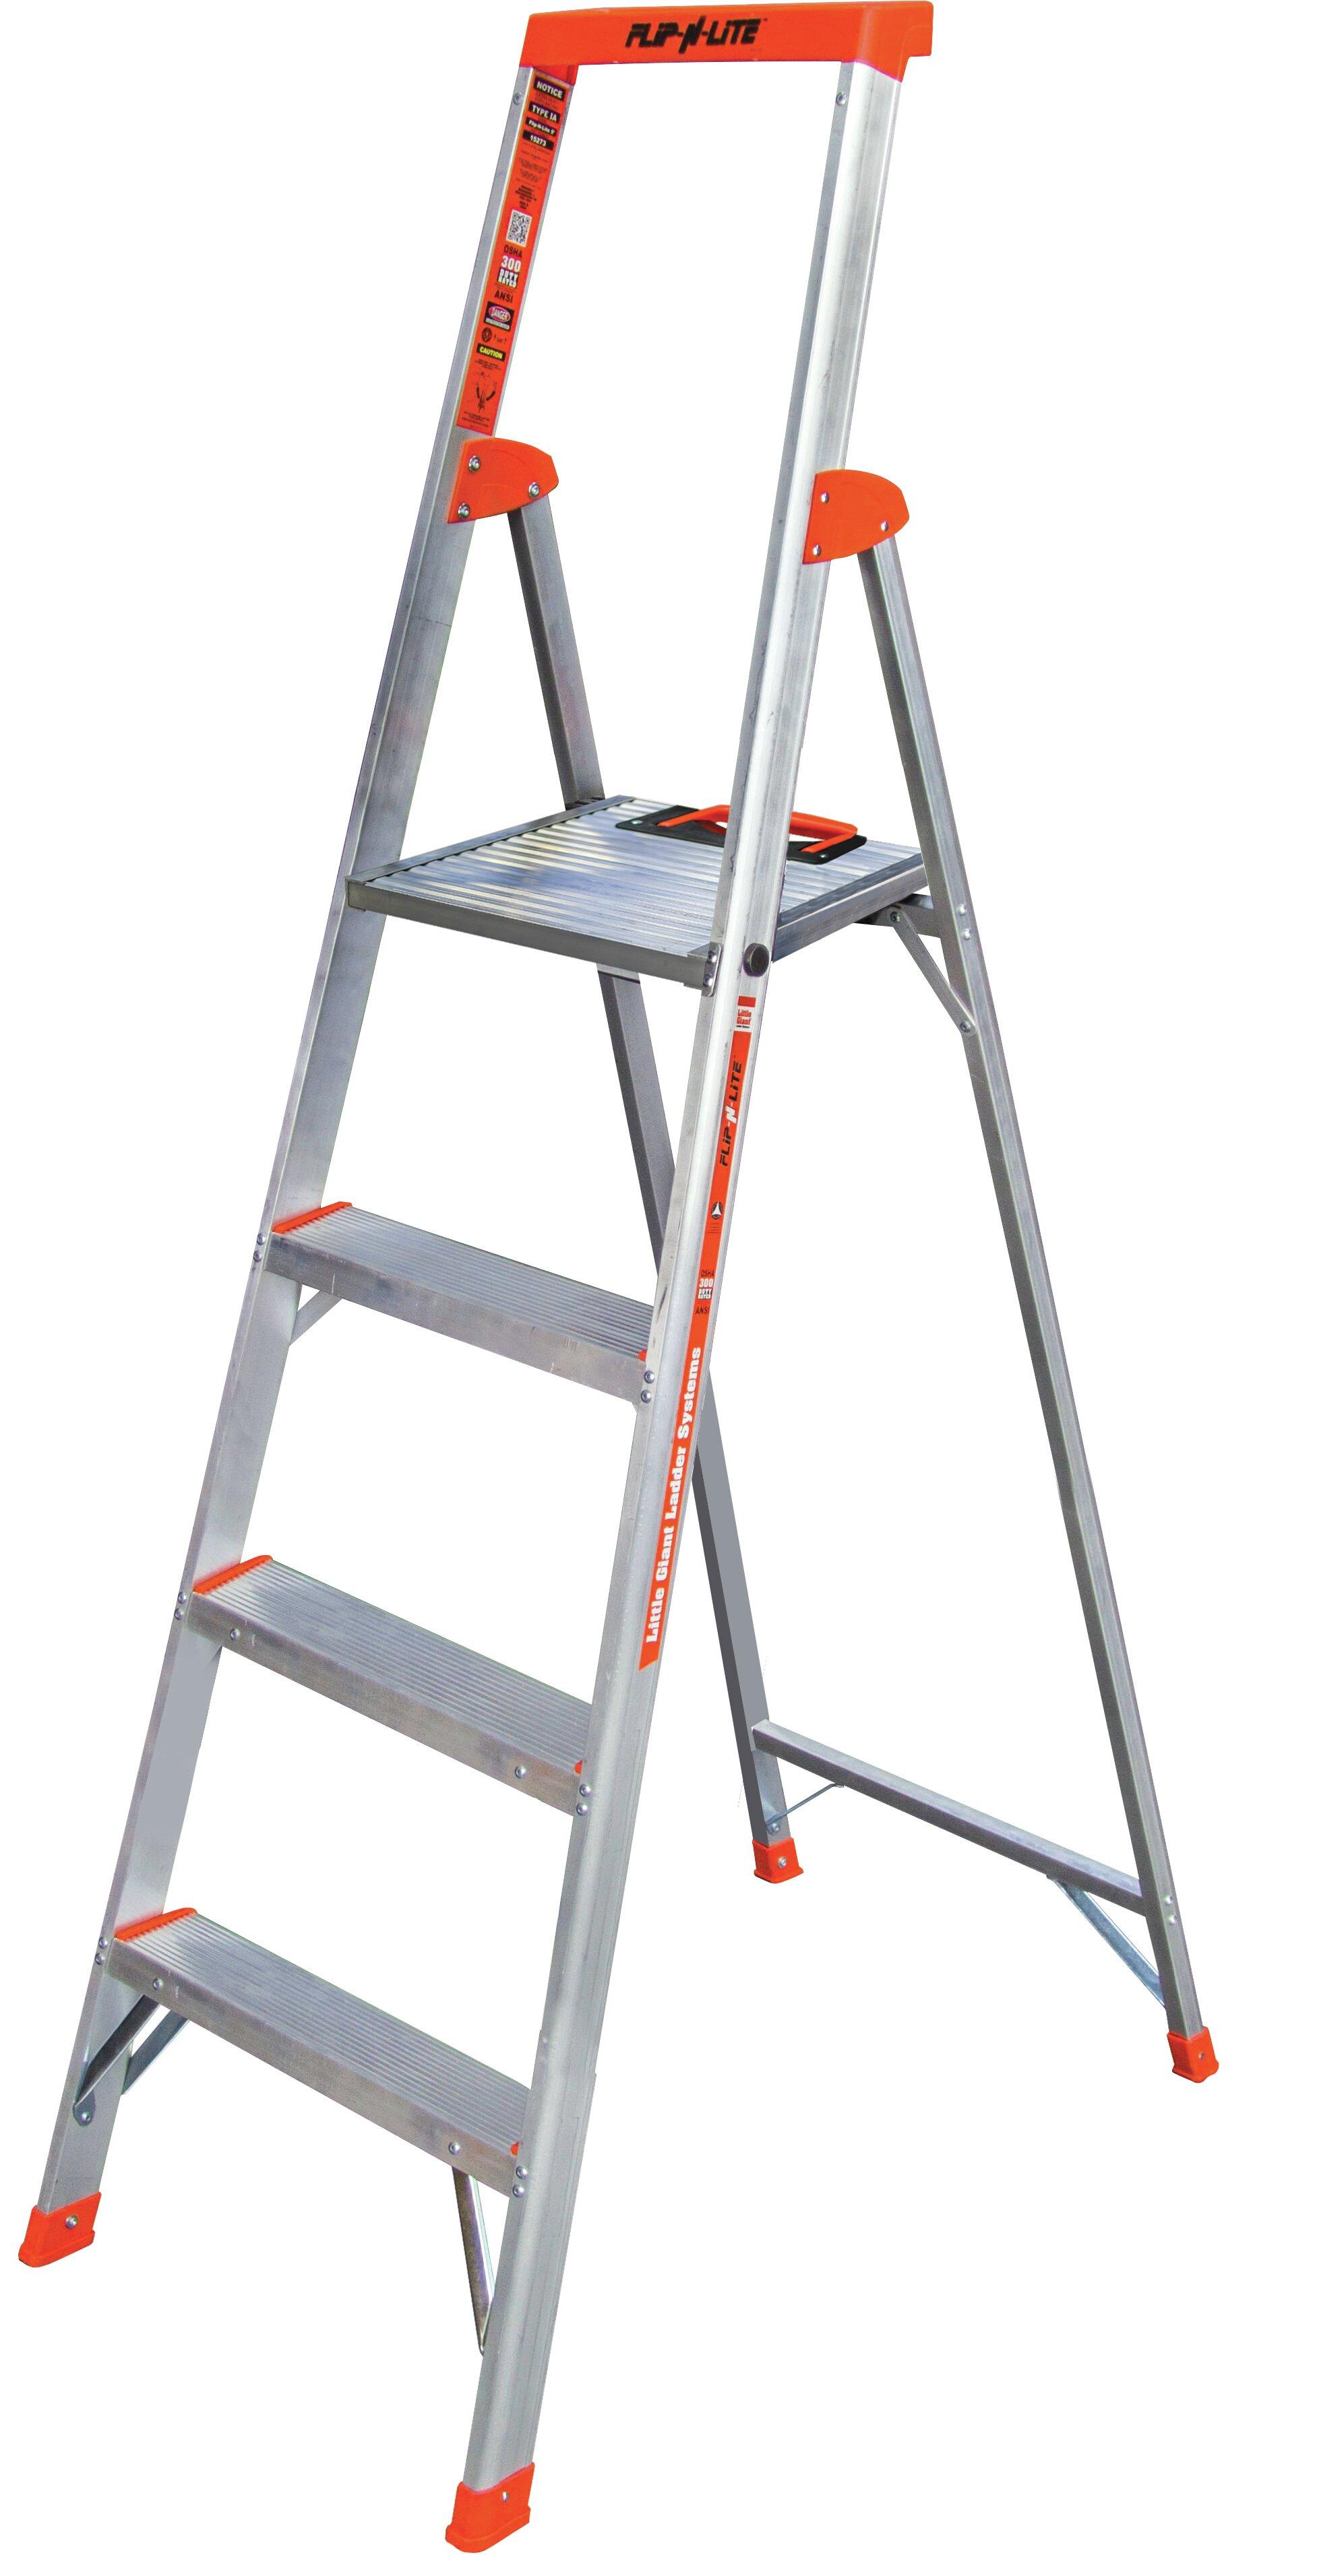 Little Giant Ladder 6 23 Ft Aluminum Flip N Lite Type 1a Step Ladder With 300 Lb Load Capacity Reviews Wayfair